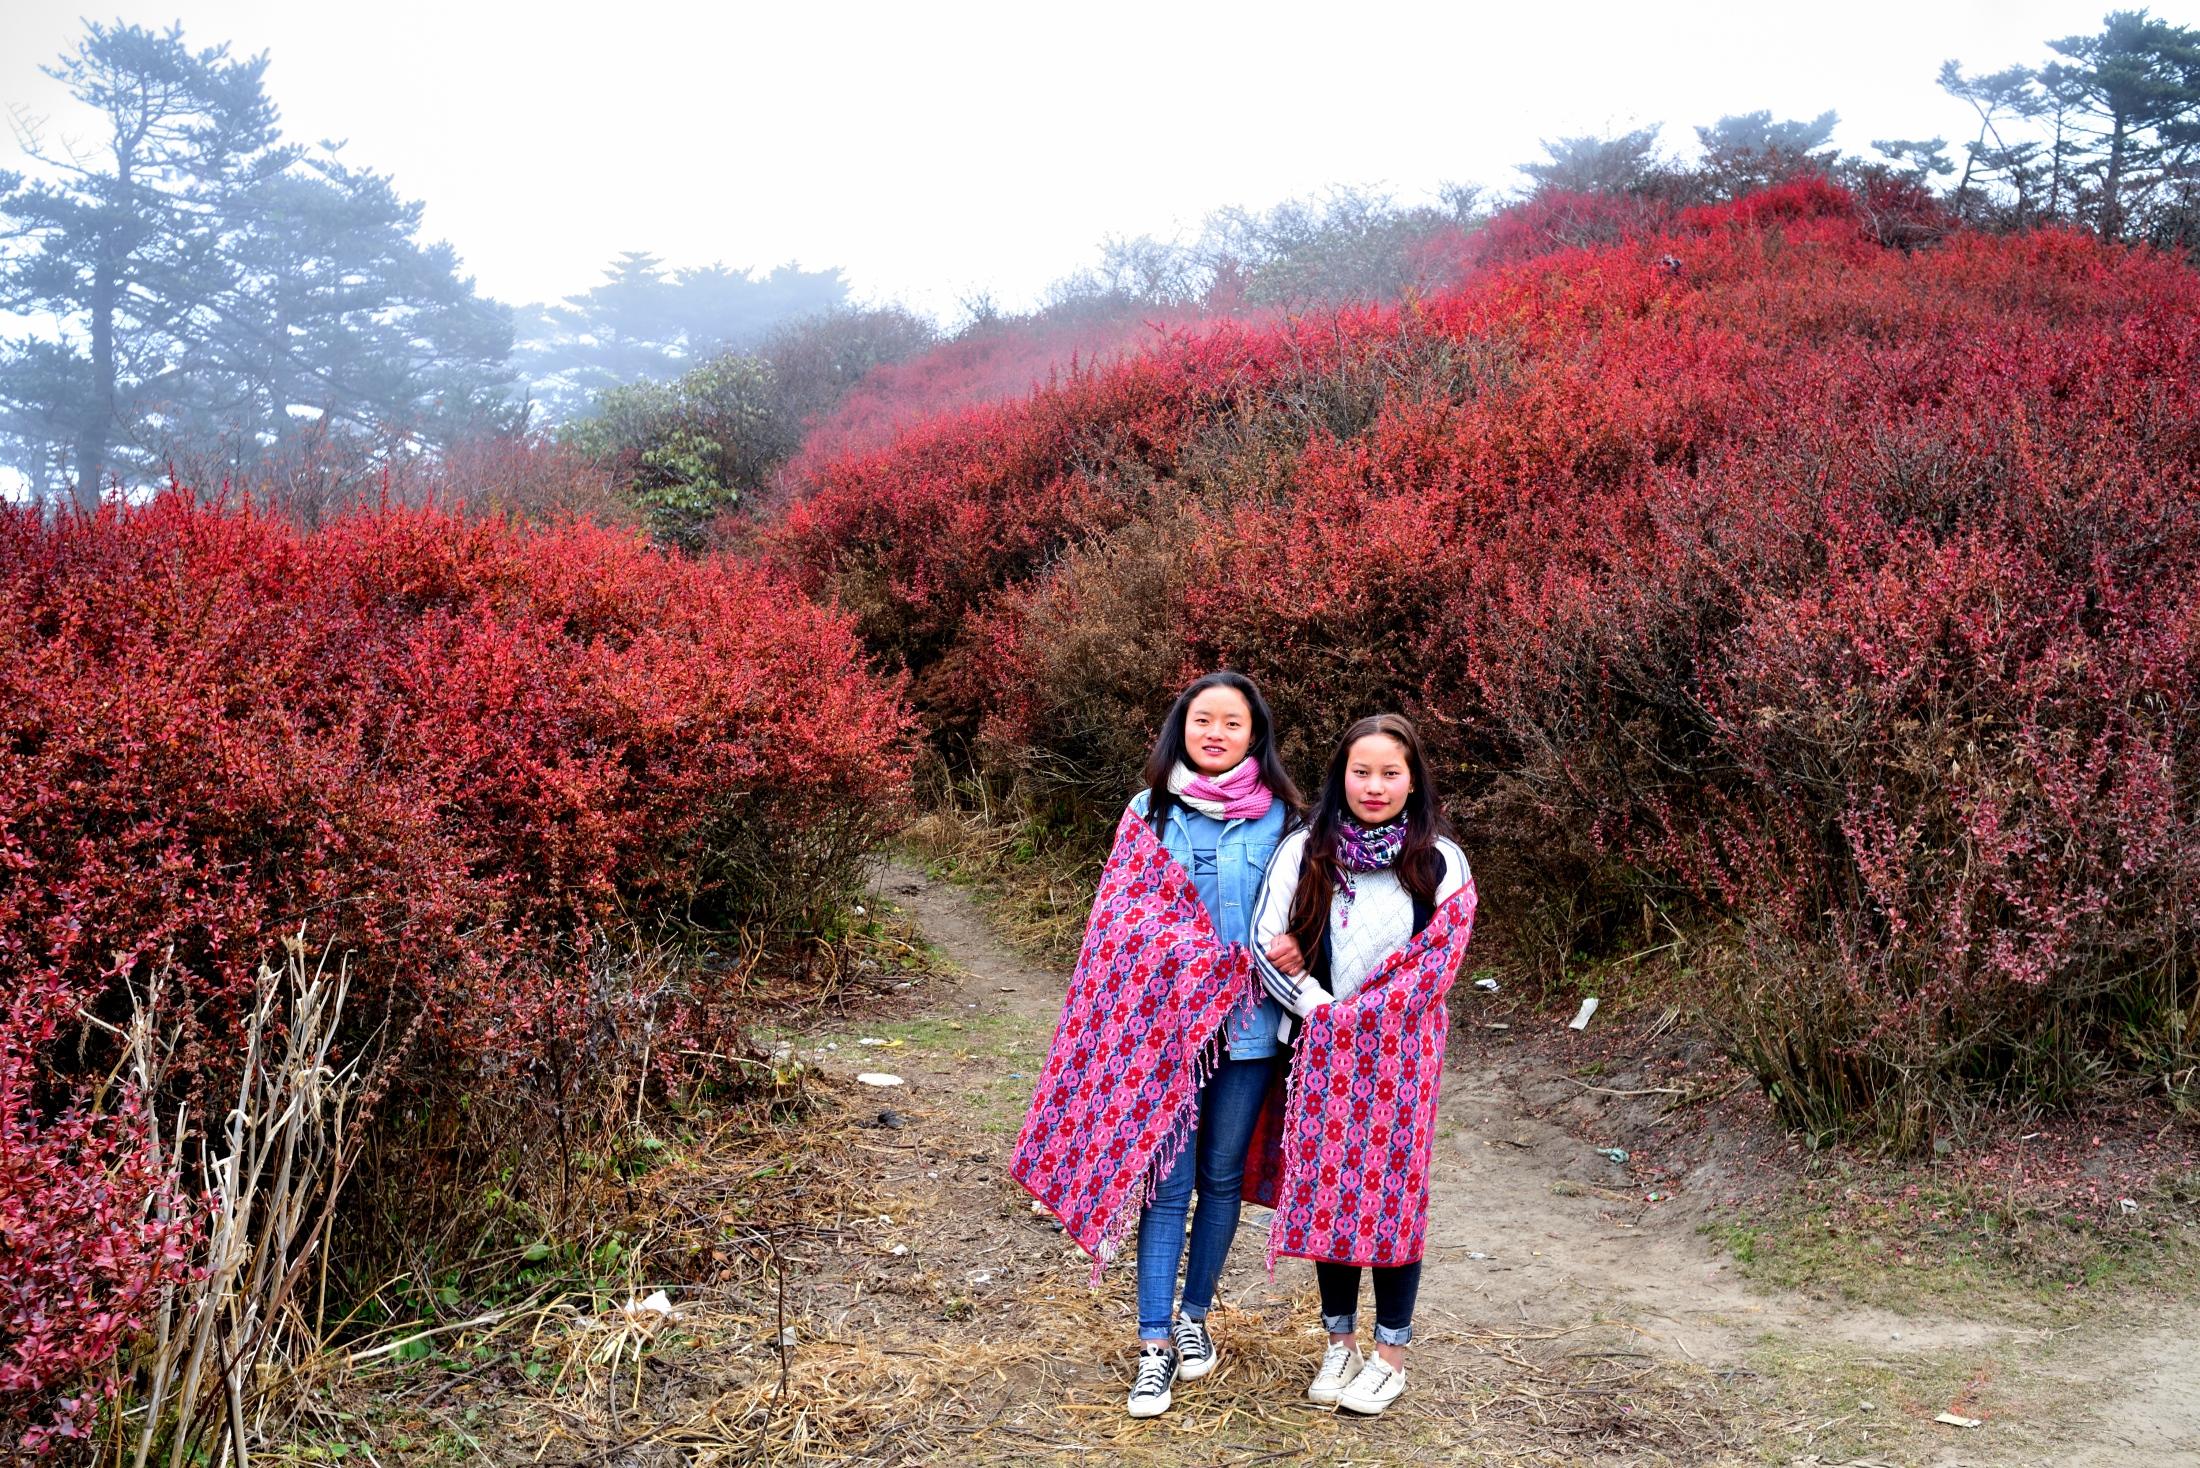 Photography image - Himalayan girls